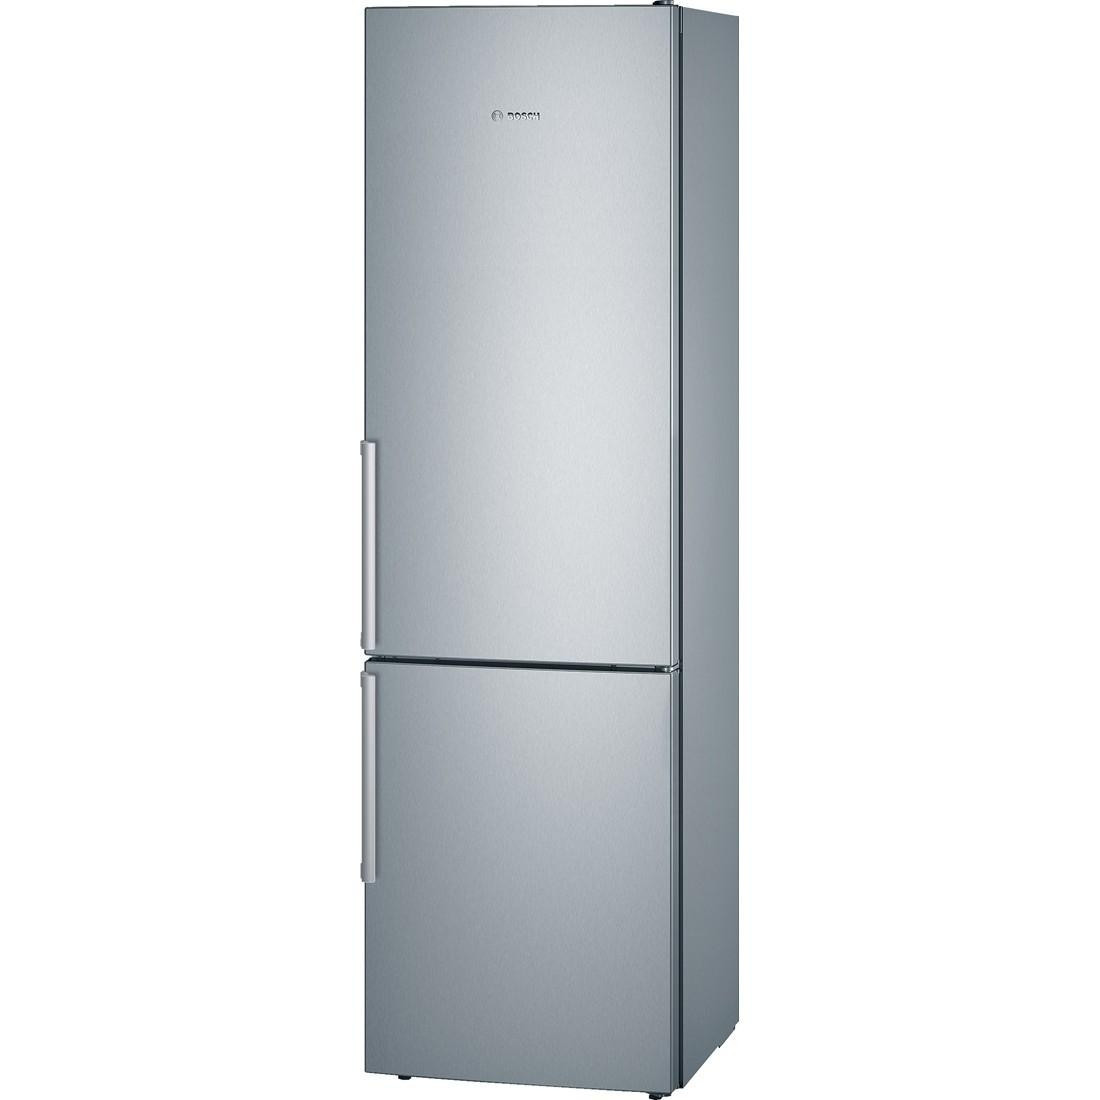 Двухкамерный холодильник Bosch KGE39AI41